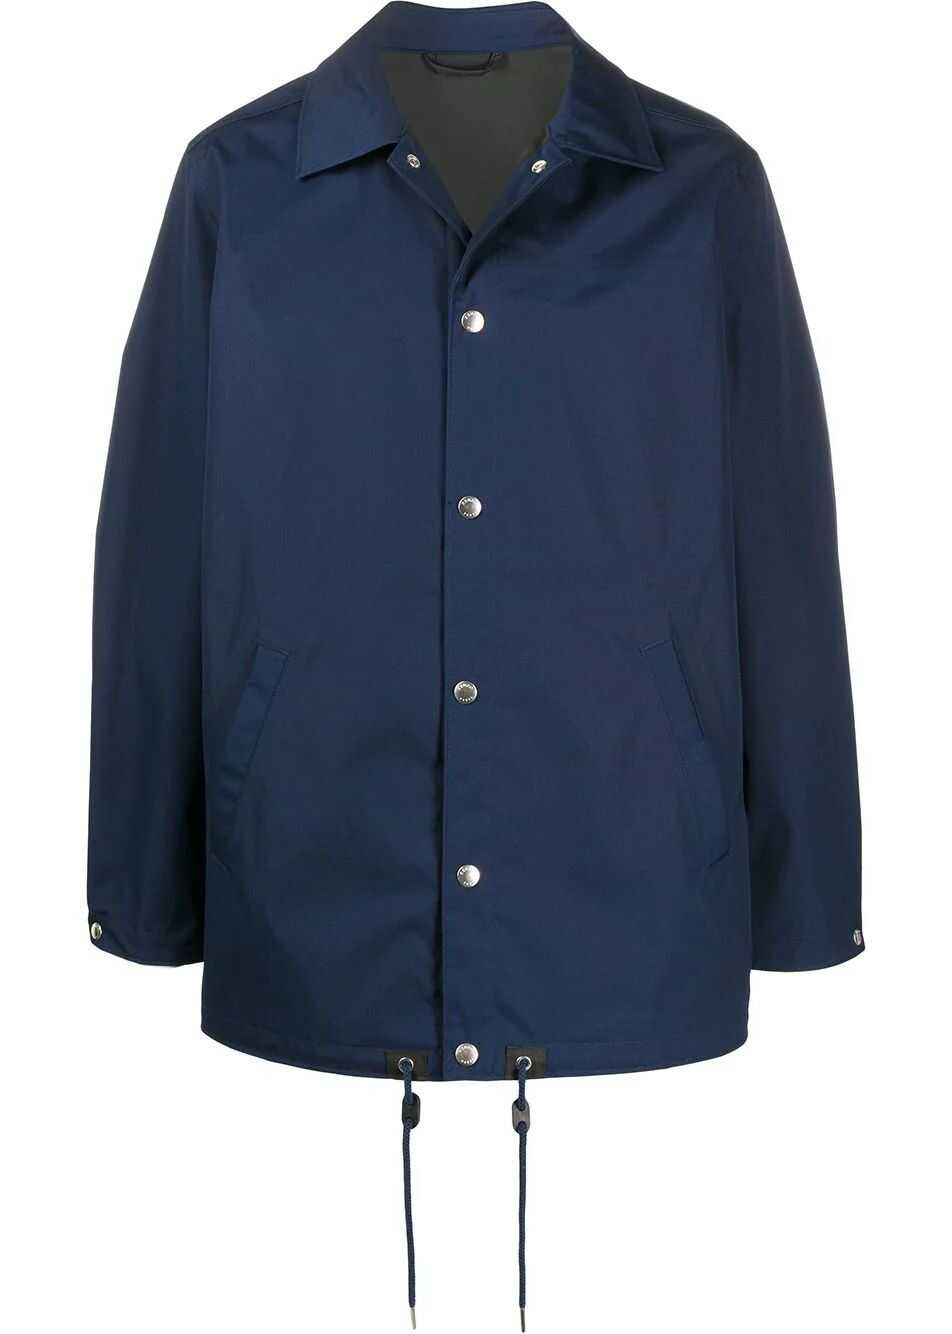 Kenzo Polyester Outerwear Jacket BLUE